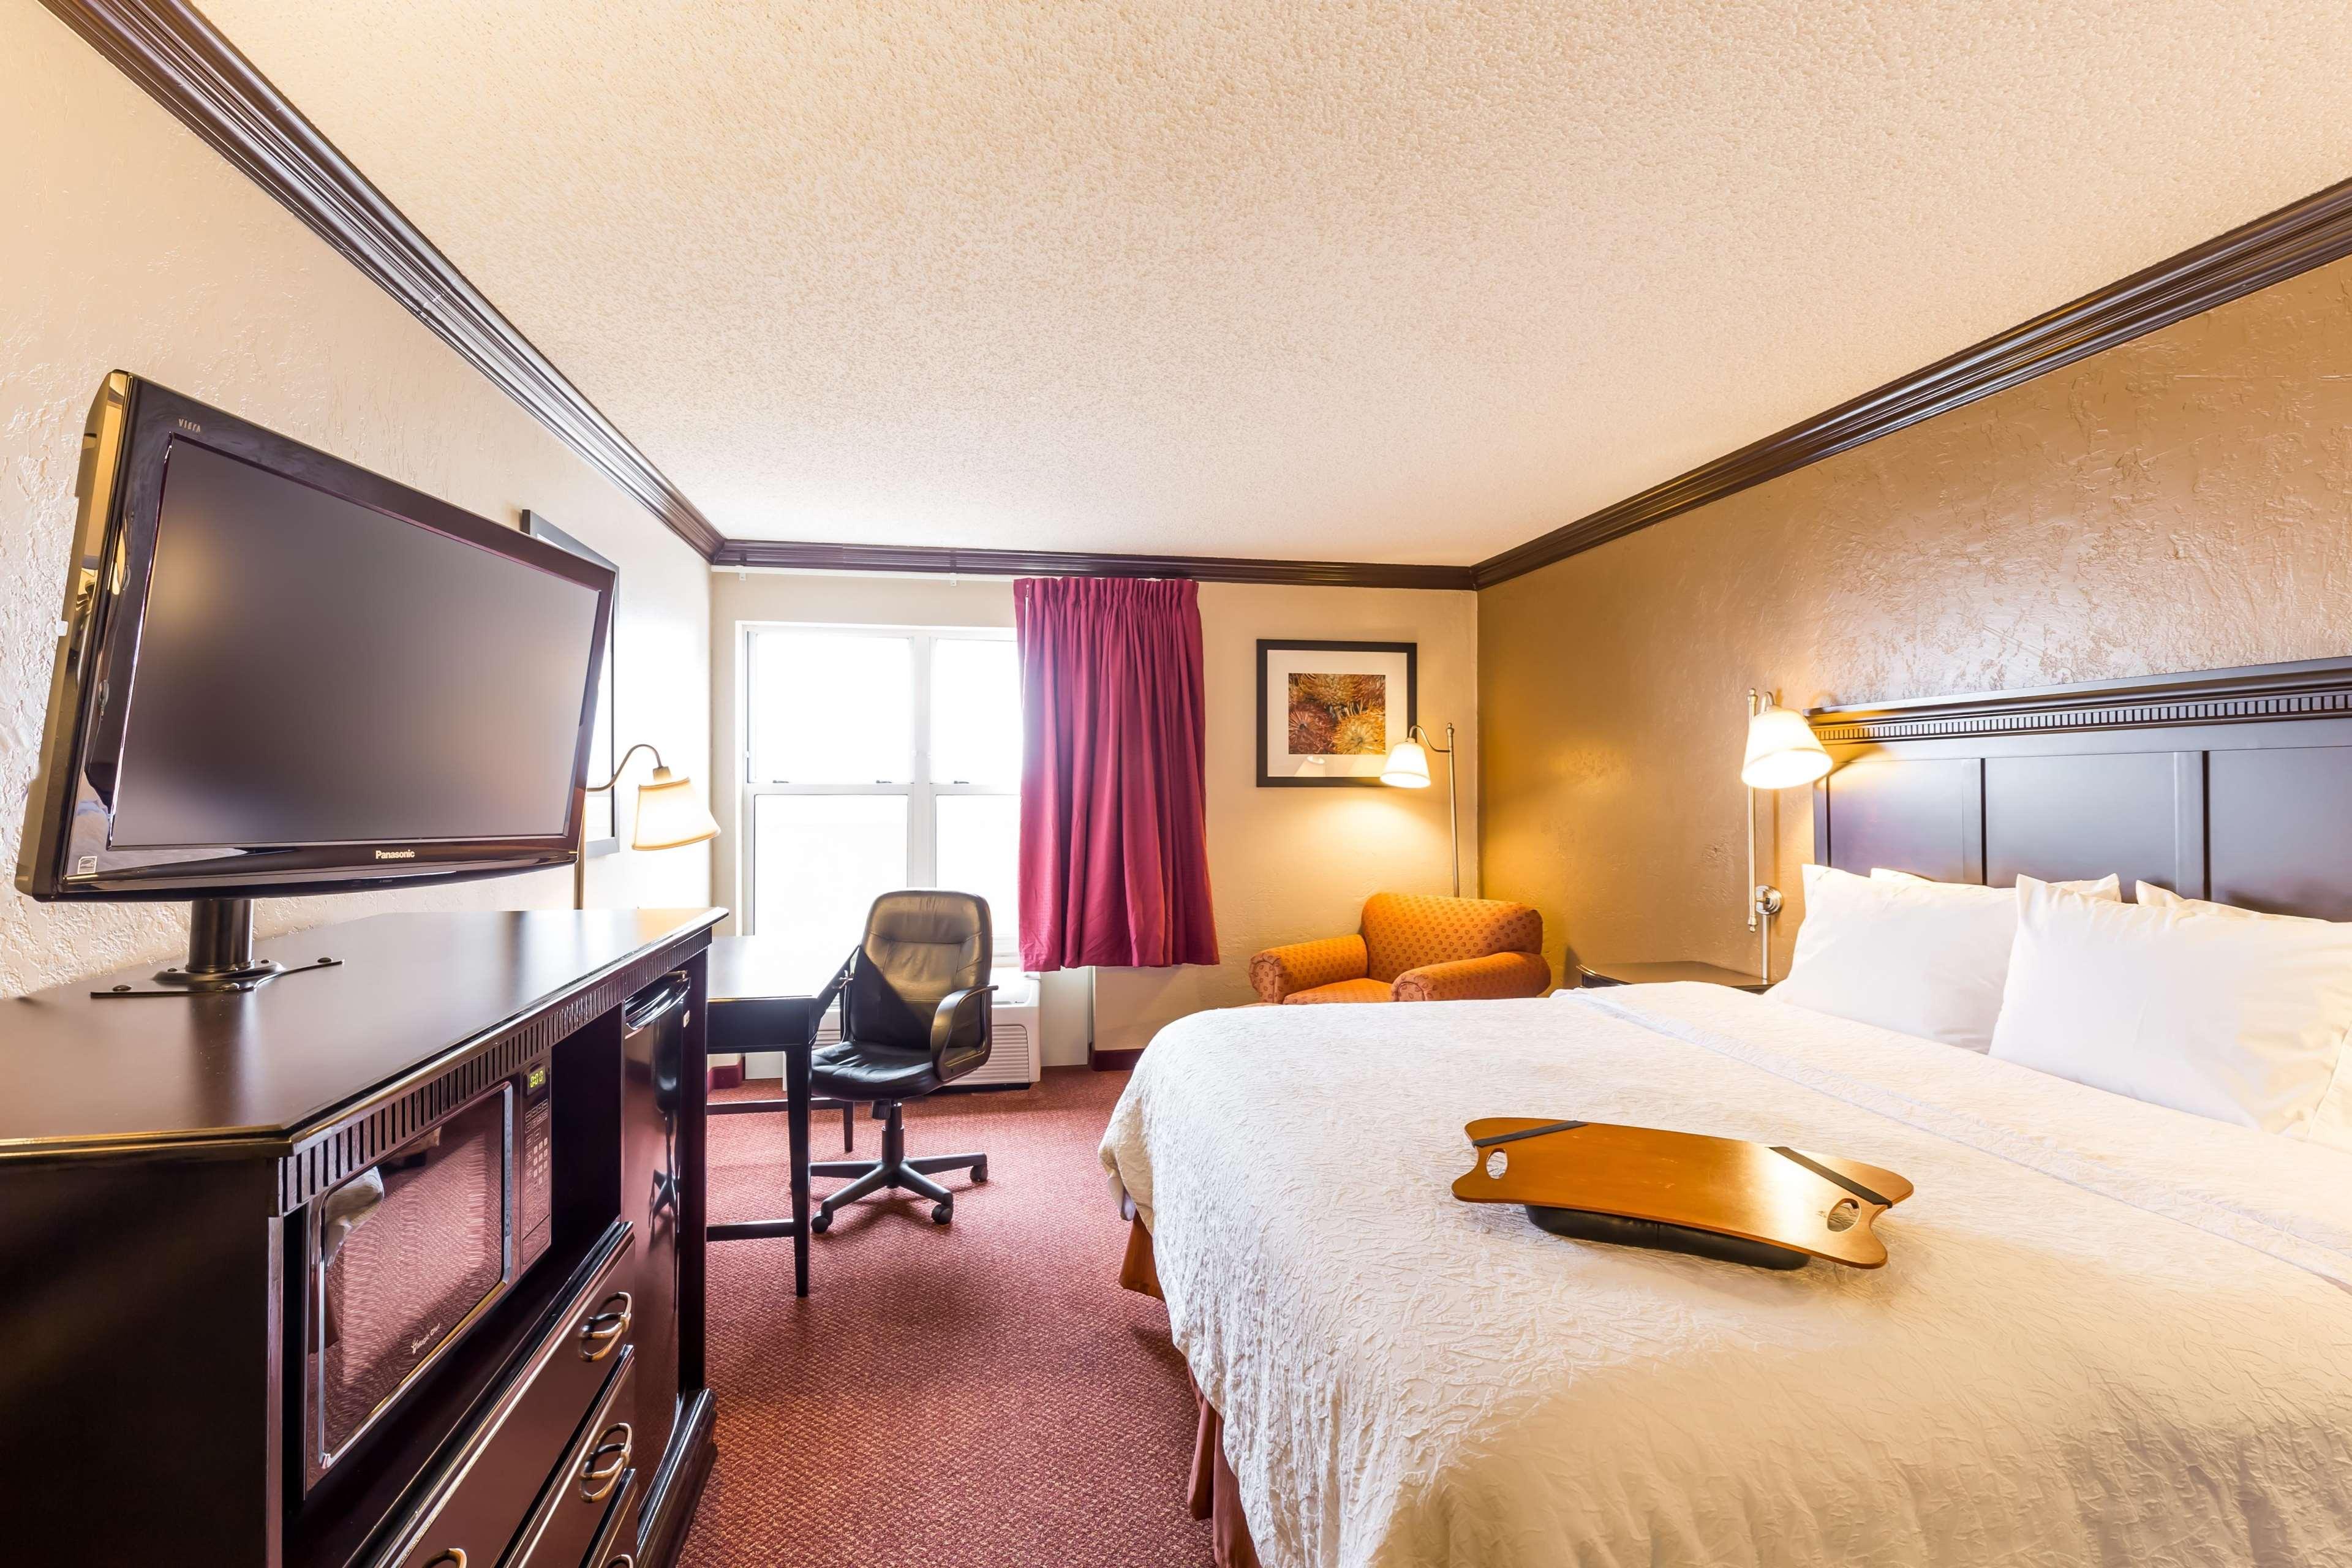 Hampton Inn & Suites Chicago/Hoffman Estates image 45